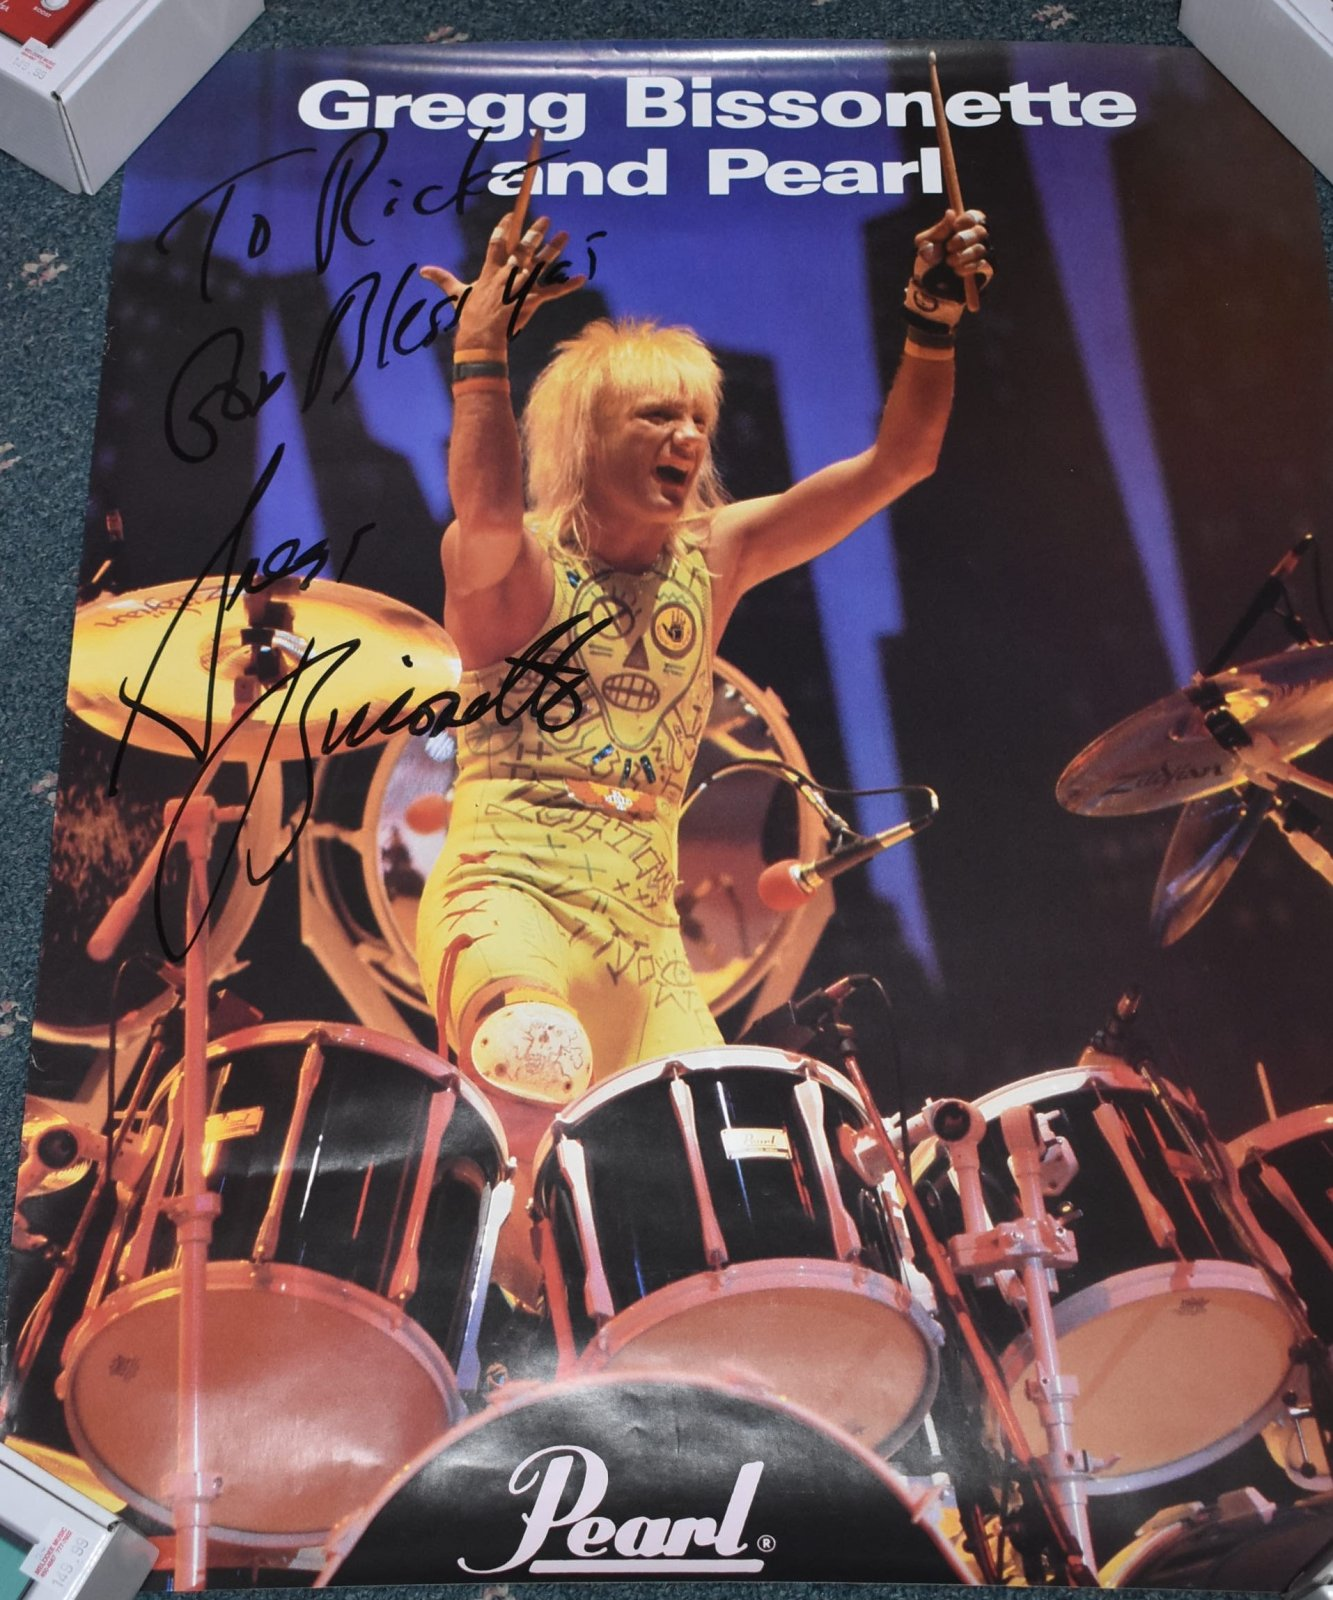 Greg Bissonette/Pearl Poster